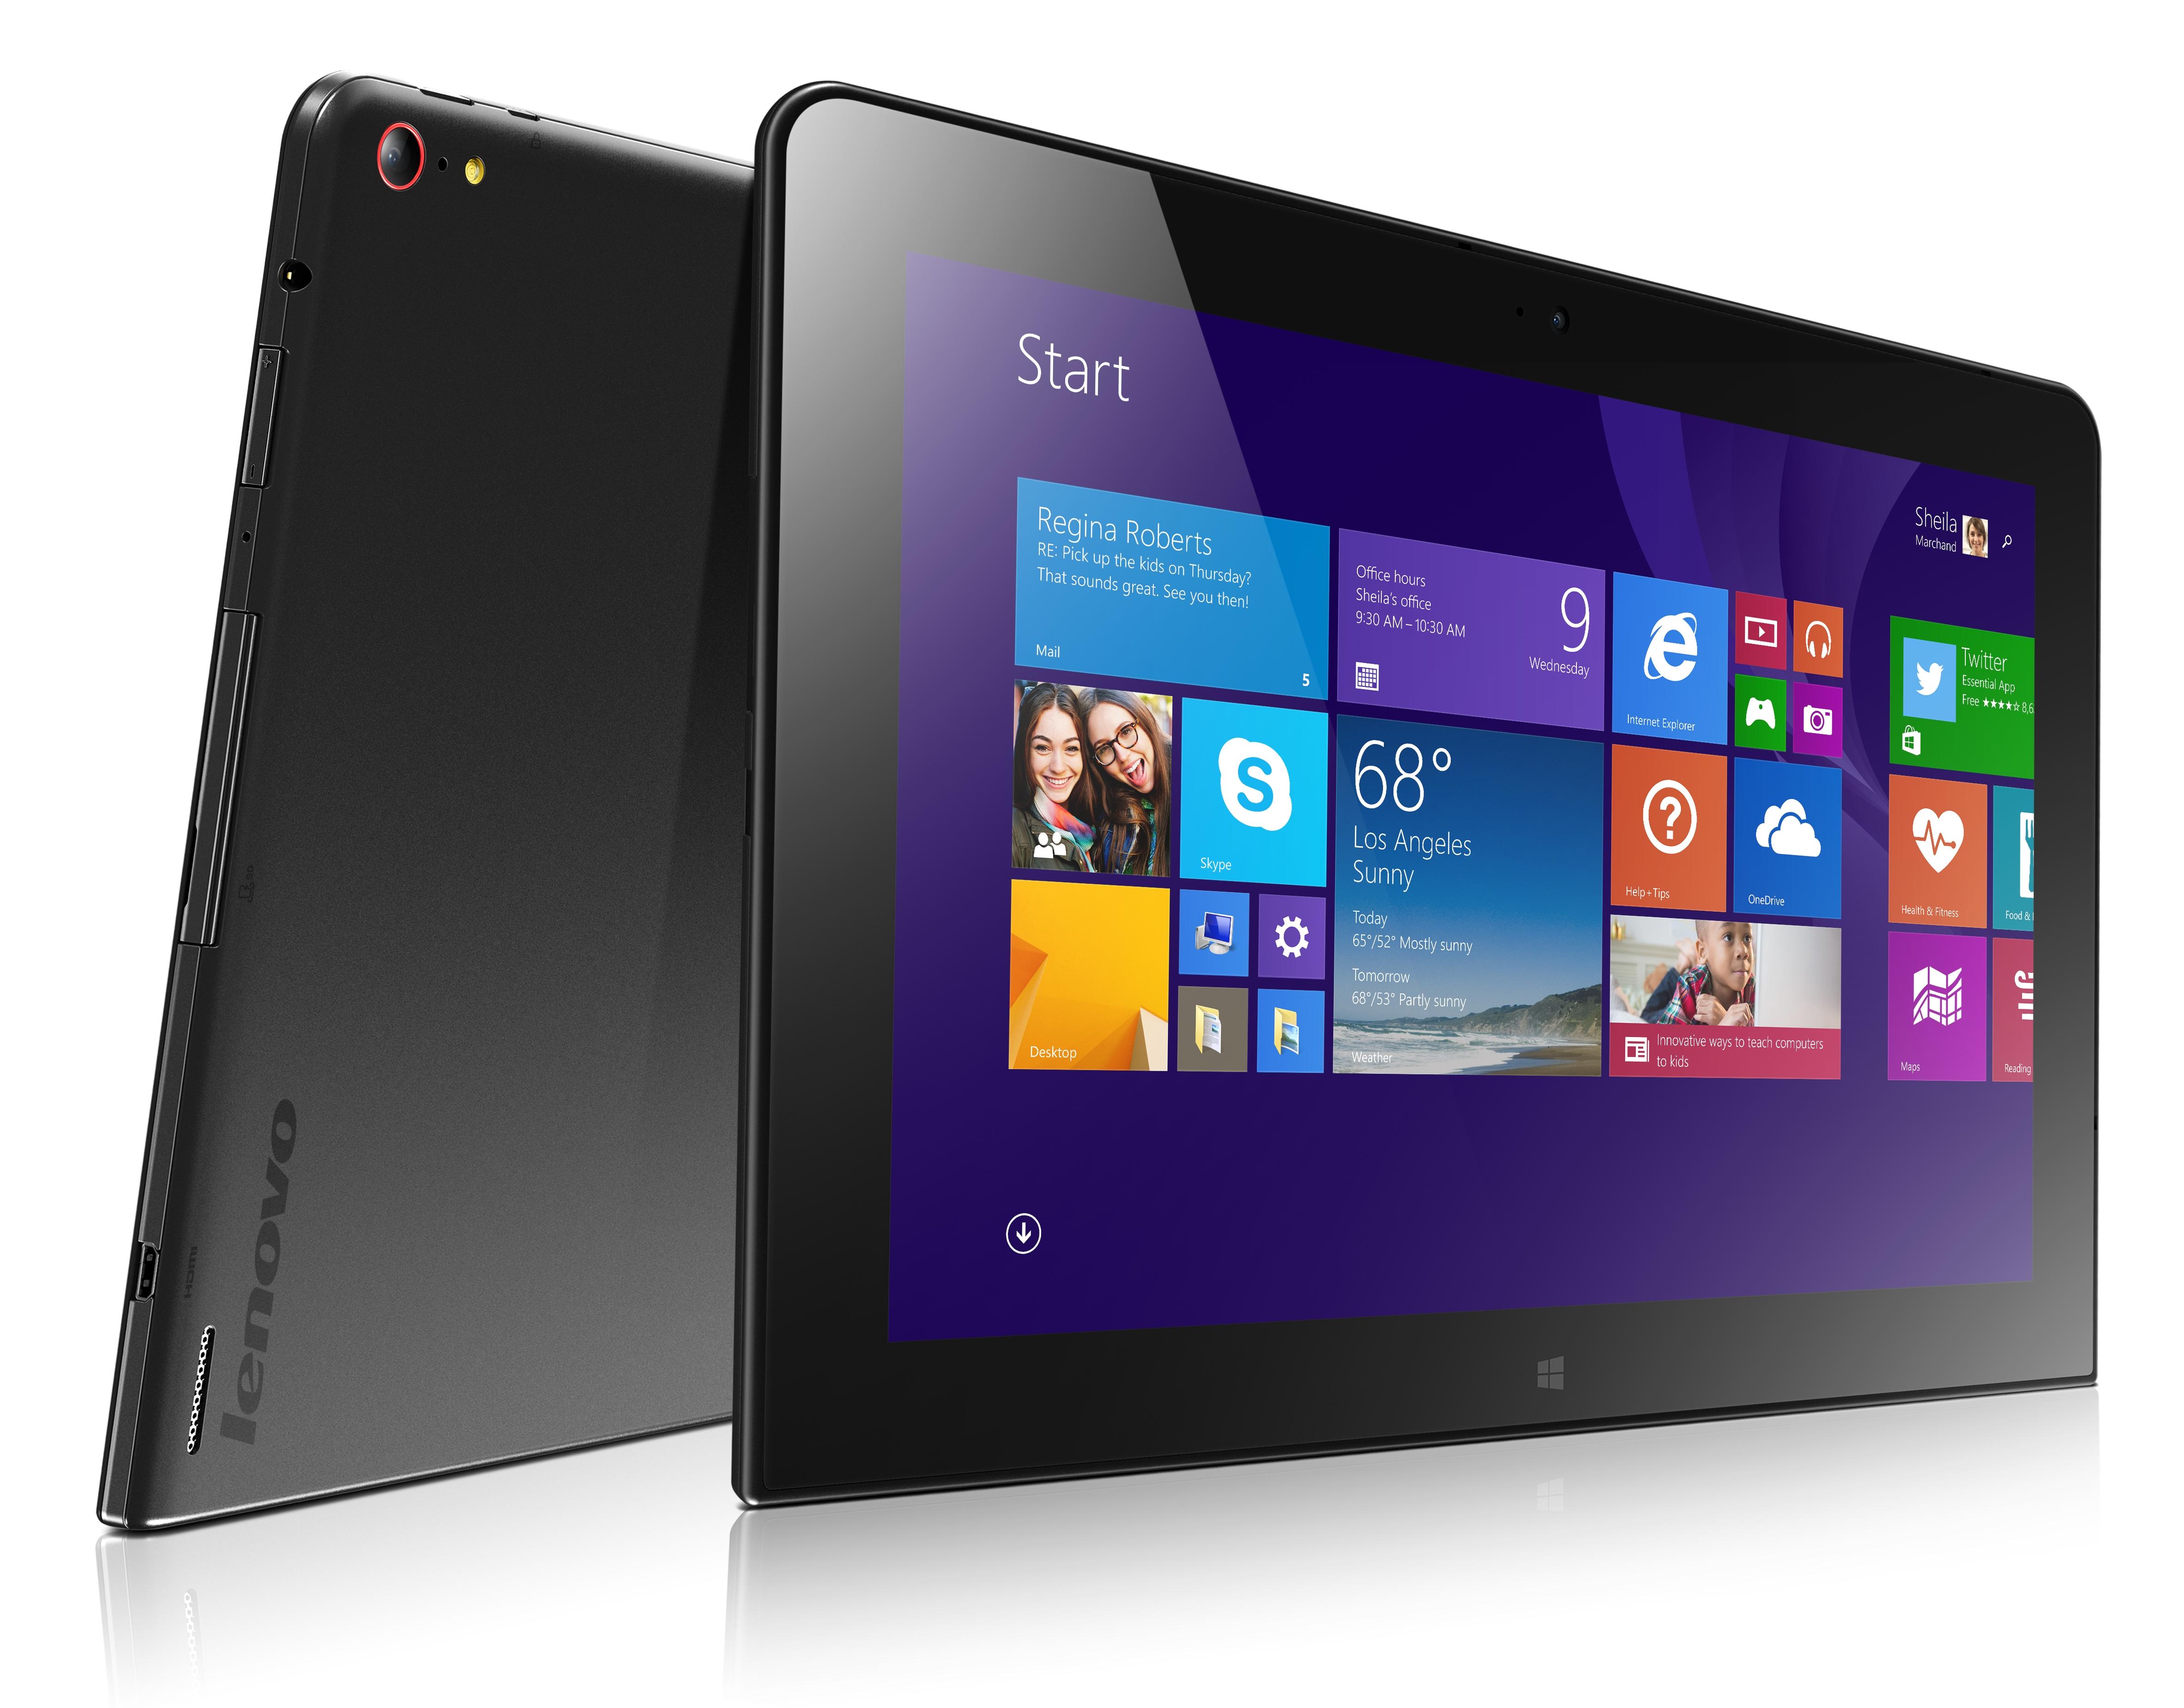 Lenovo ThinkPad 10 - 10-calowy tablet z Atom i Windows 8.1